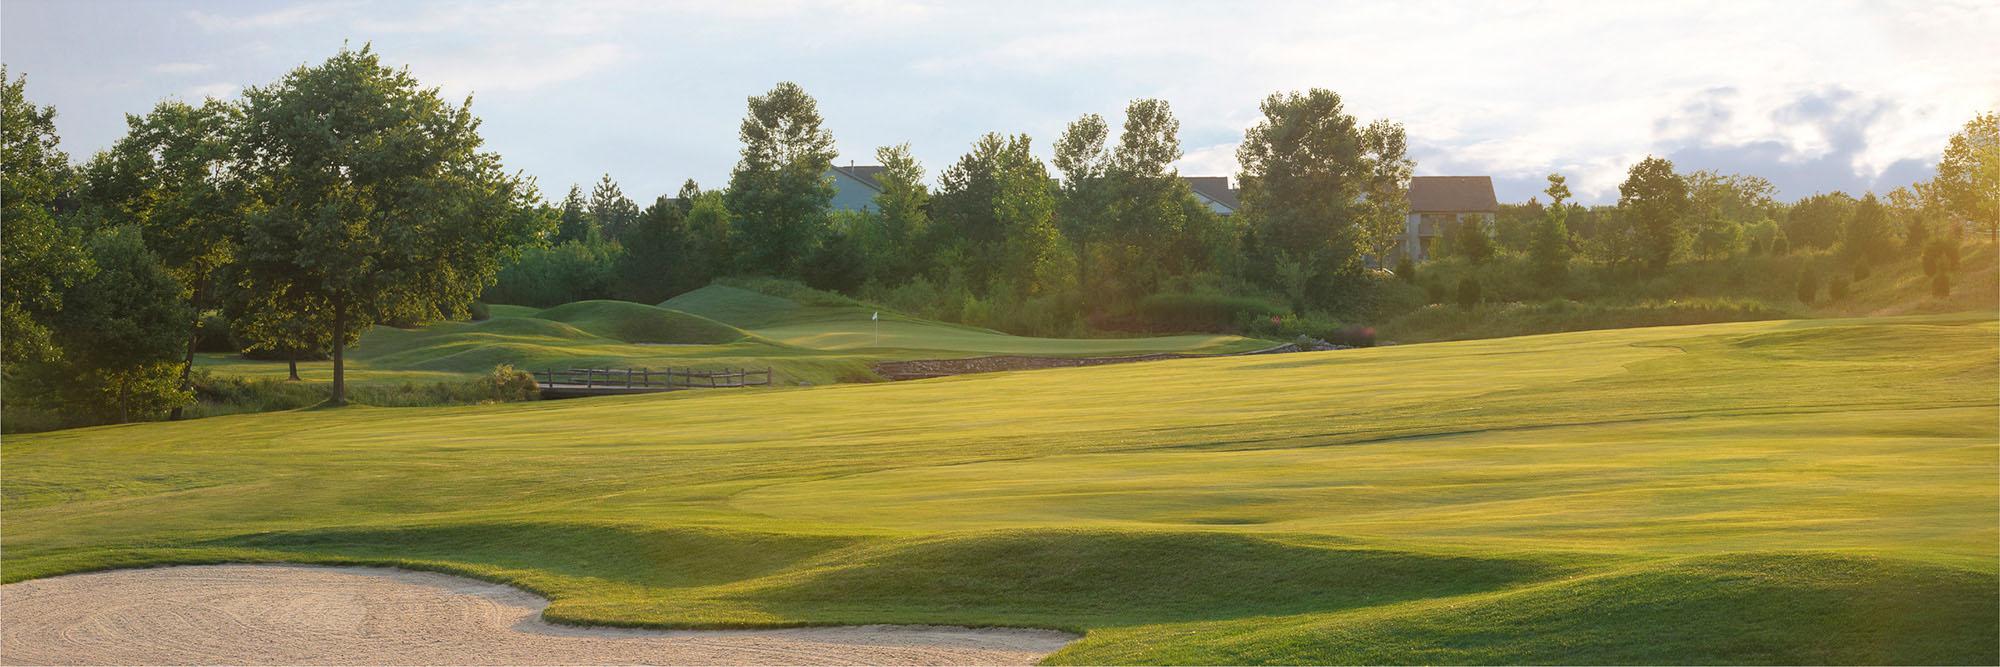 Golf Course Image - Heritage Club No. 14